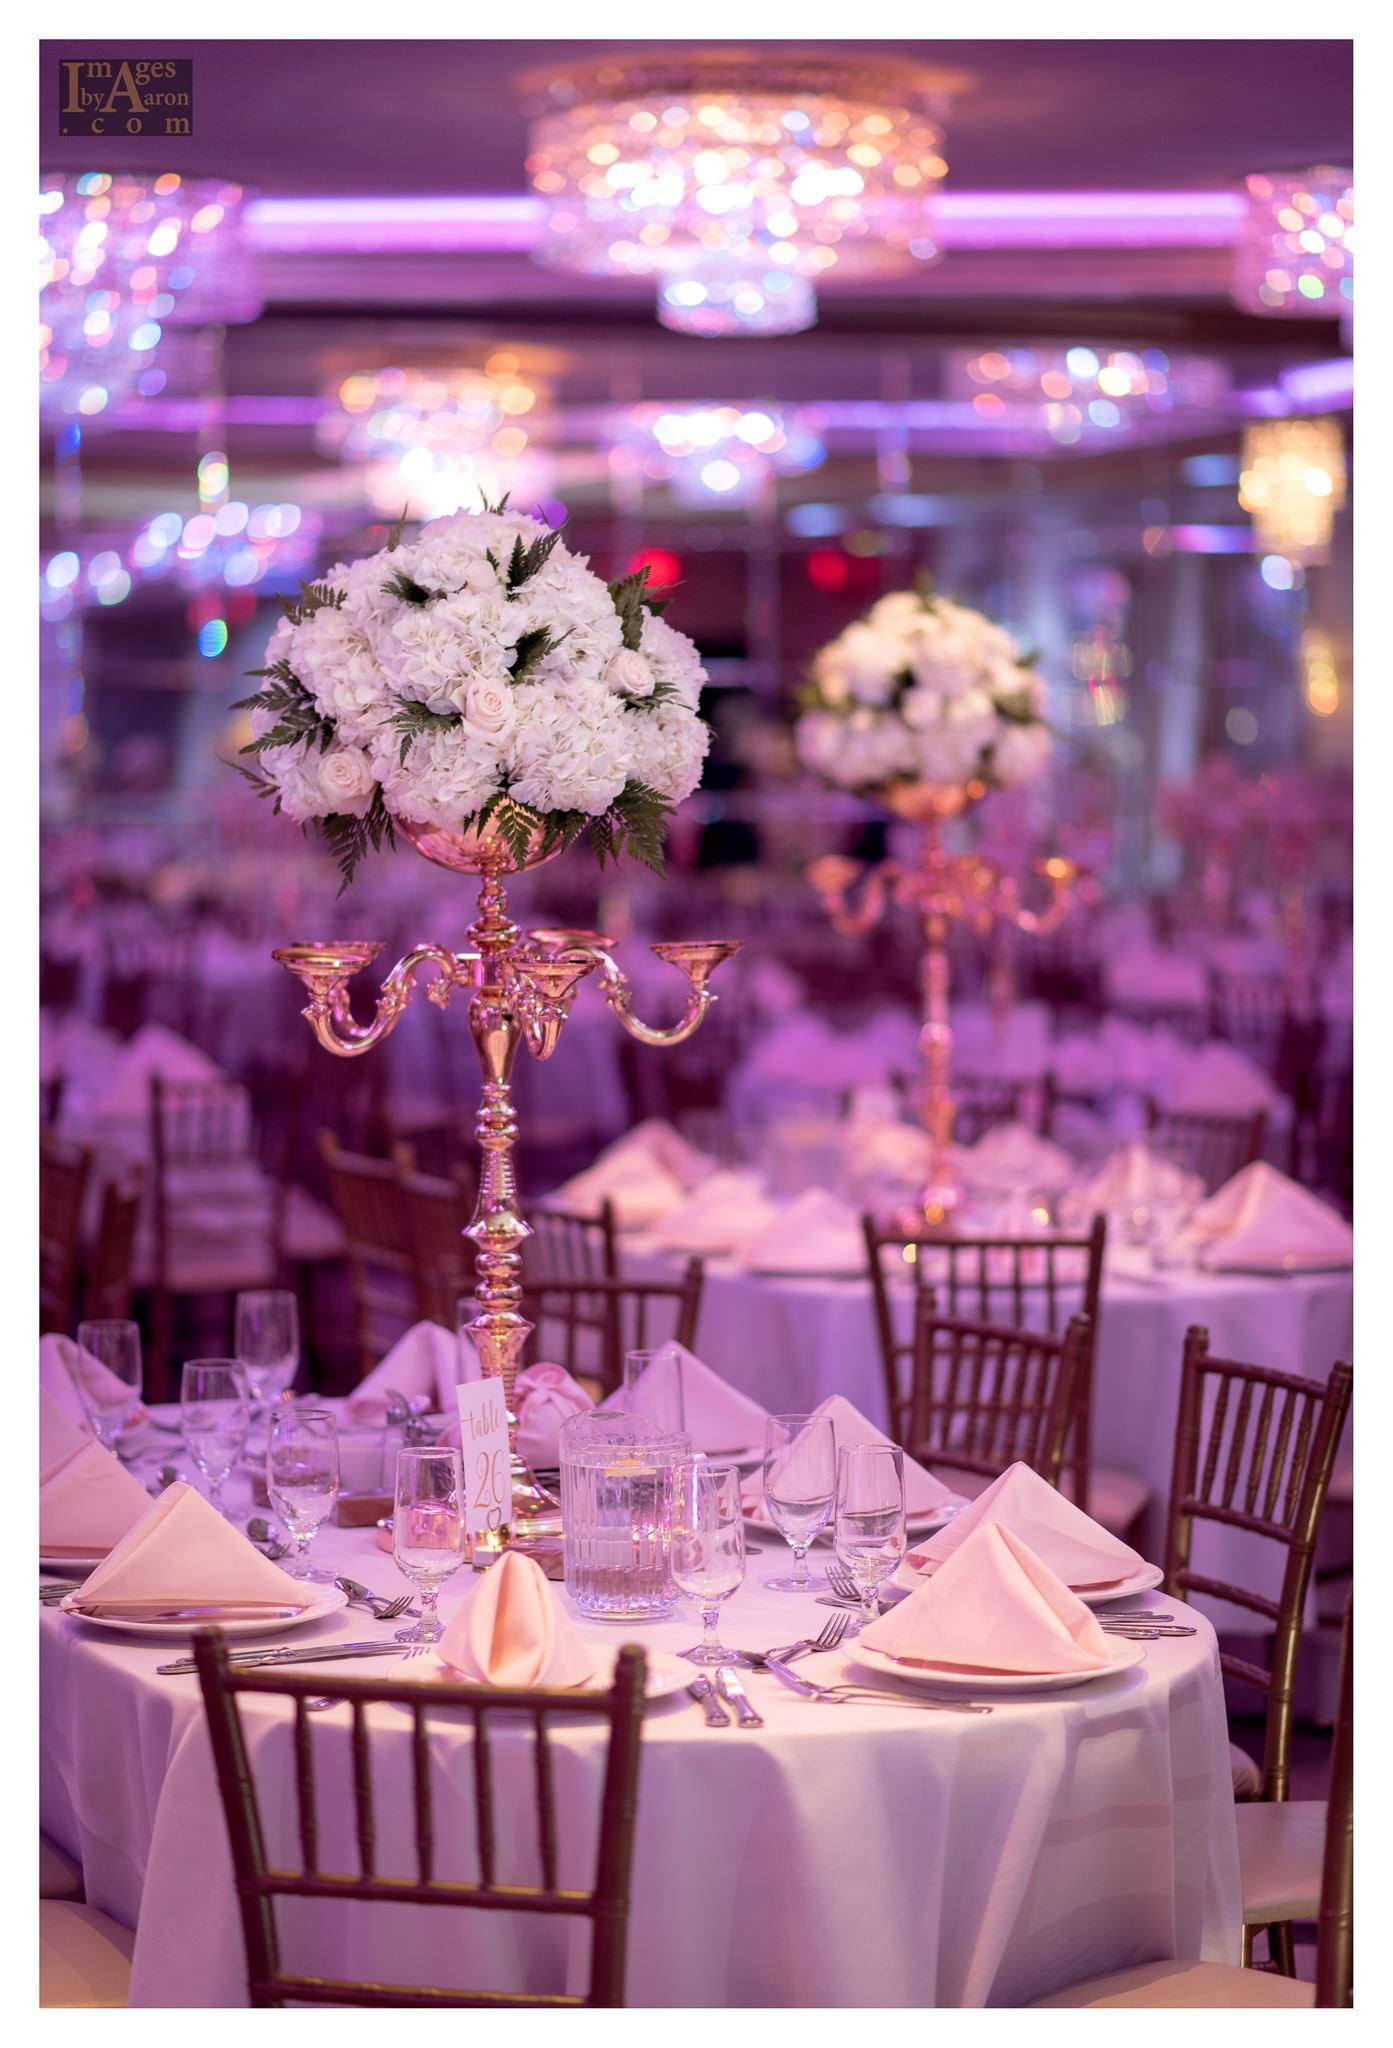 Gokce Turkish Wedding Reception New York Photographer Wedding Photography The Royal Manor-3.jpg